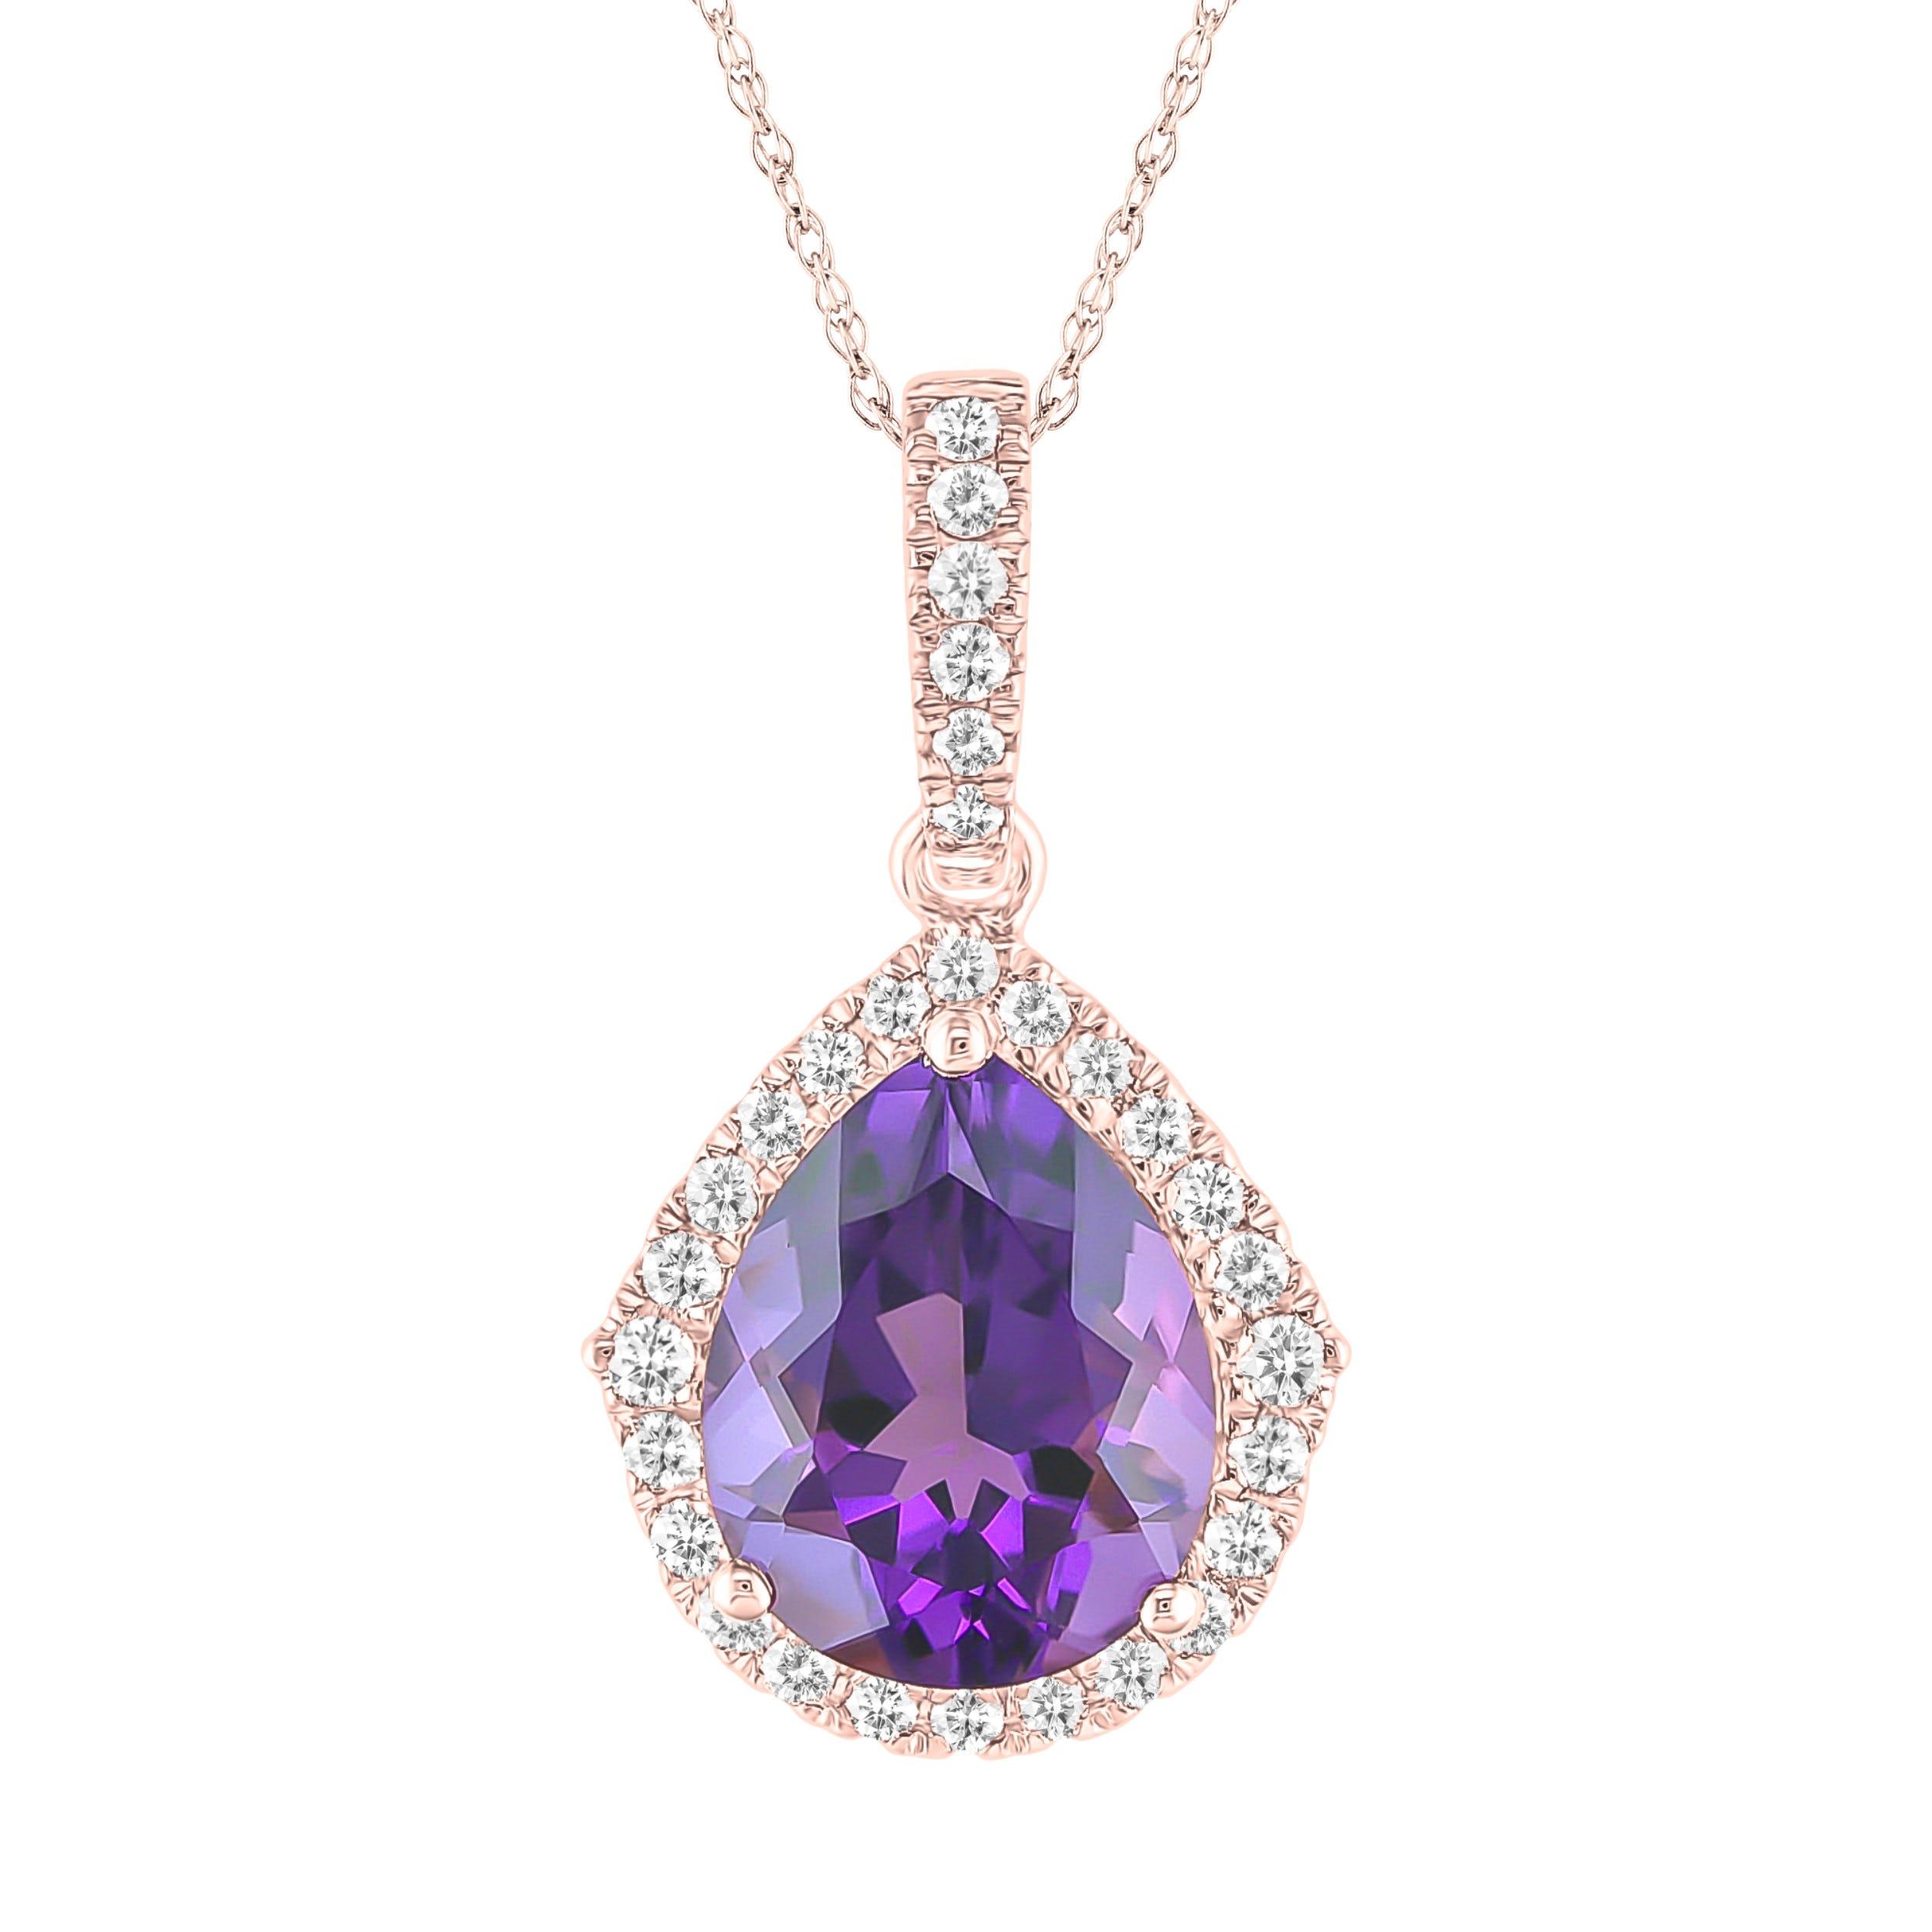 Amethyst & Diamond Pear Pendant in 10k Rose Gold